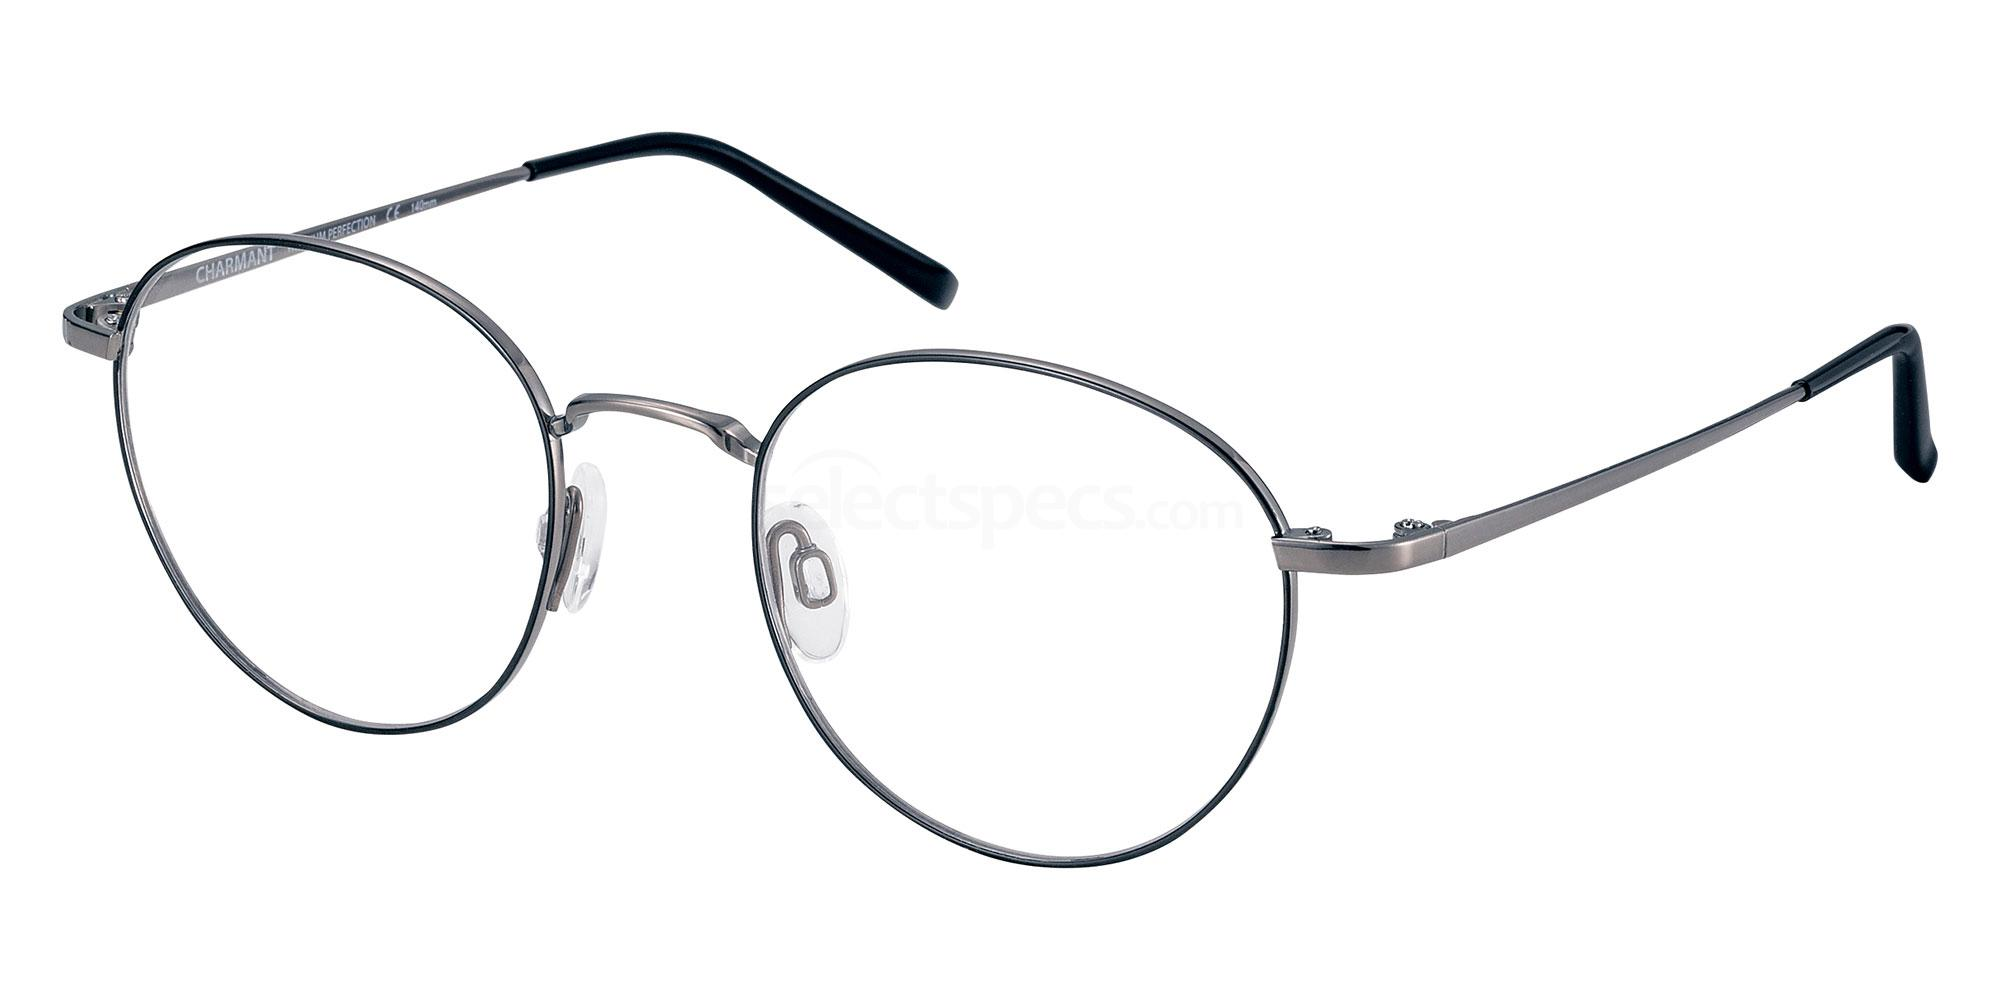 BK CH11466U Glasses, Charmant Titanium Perfection